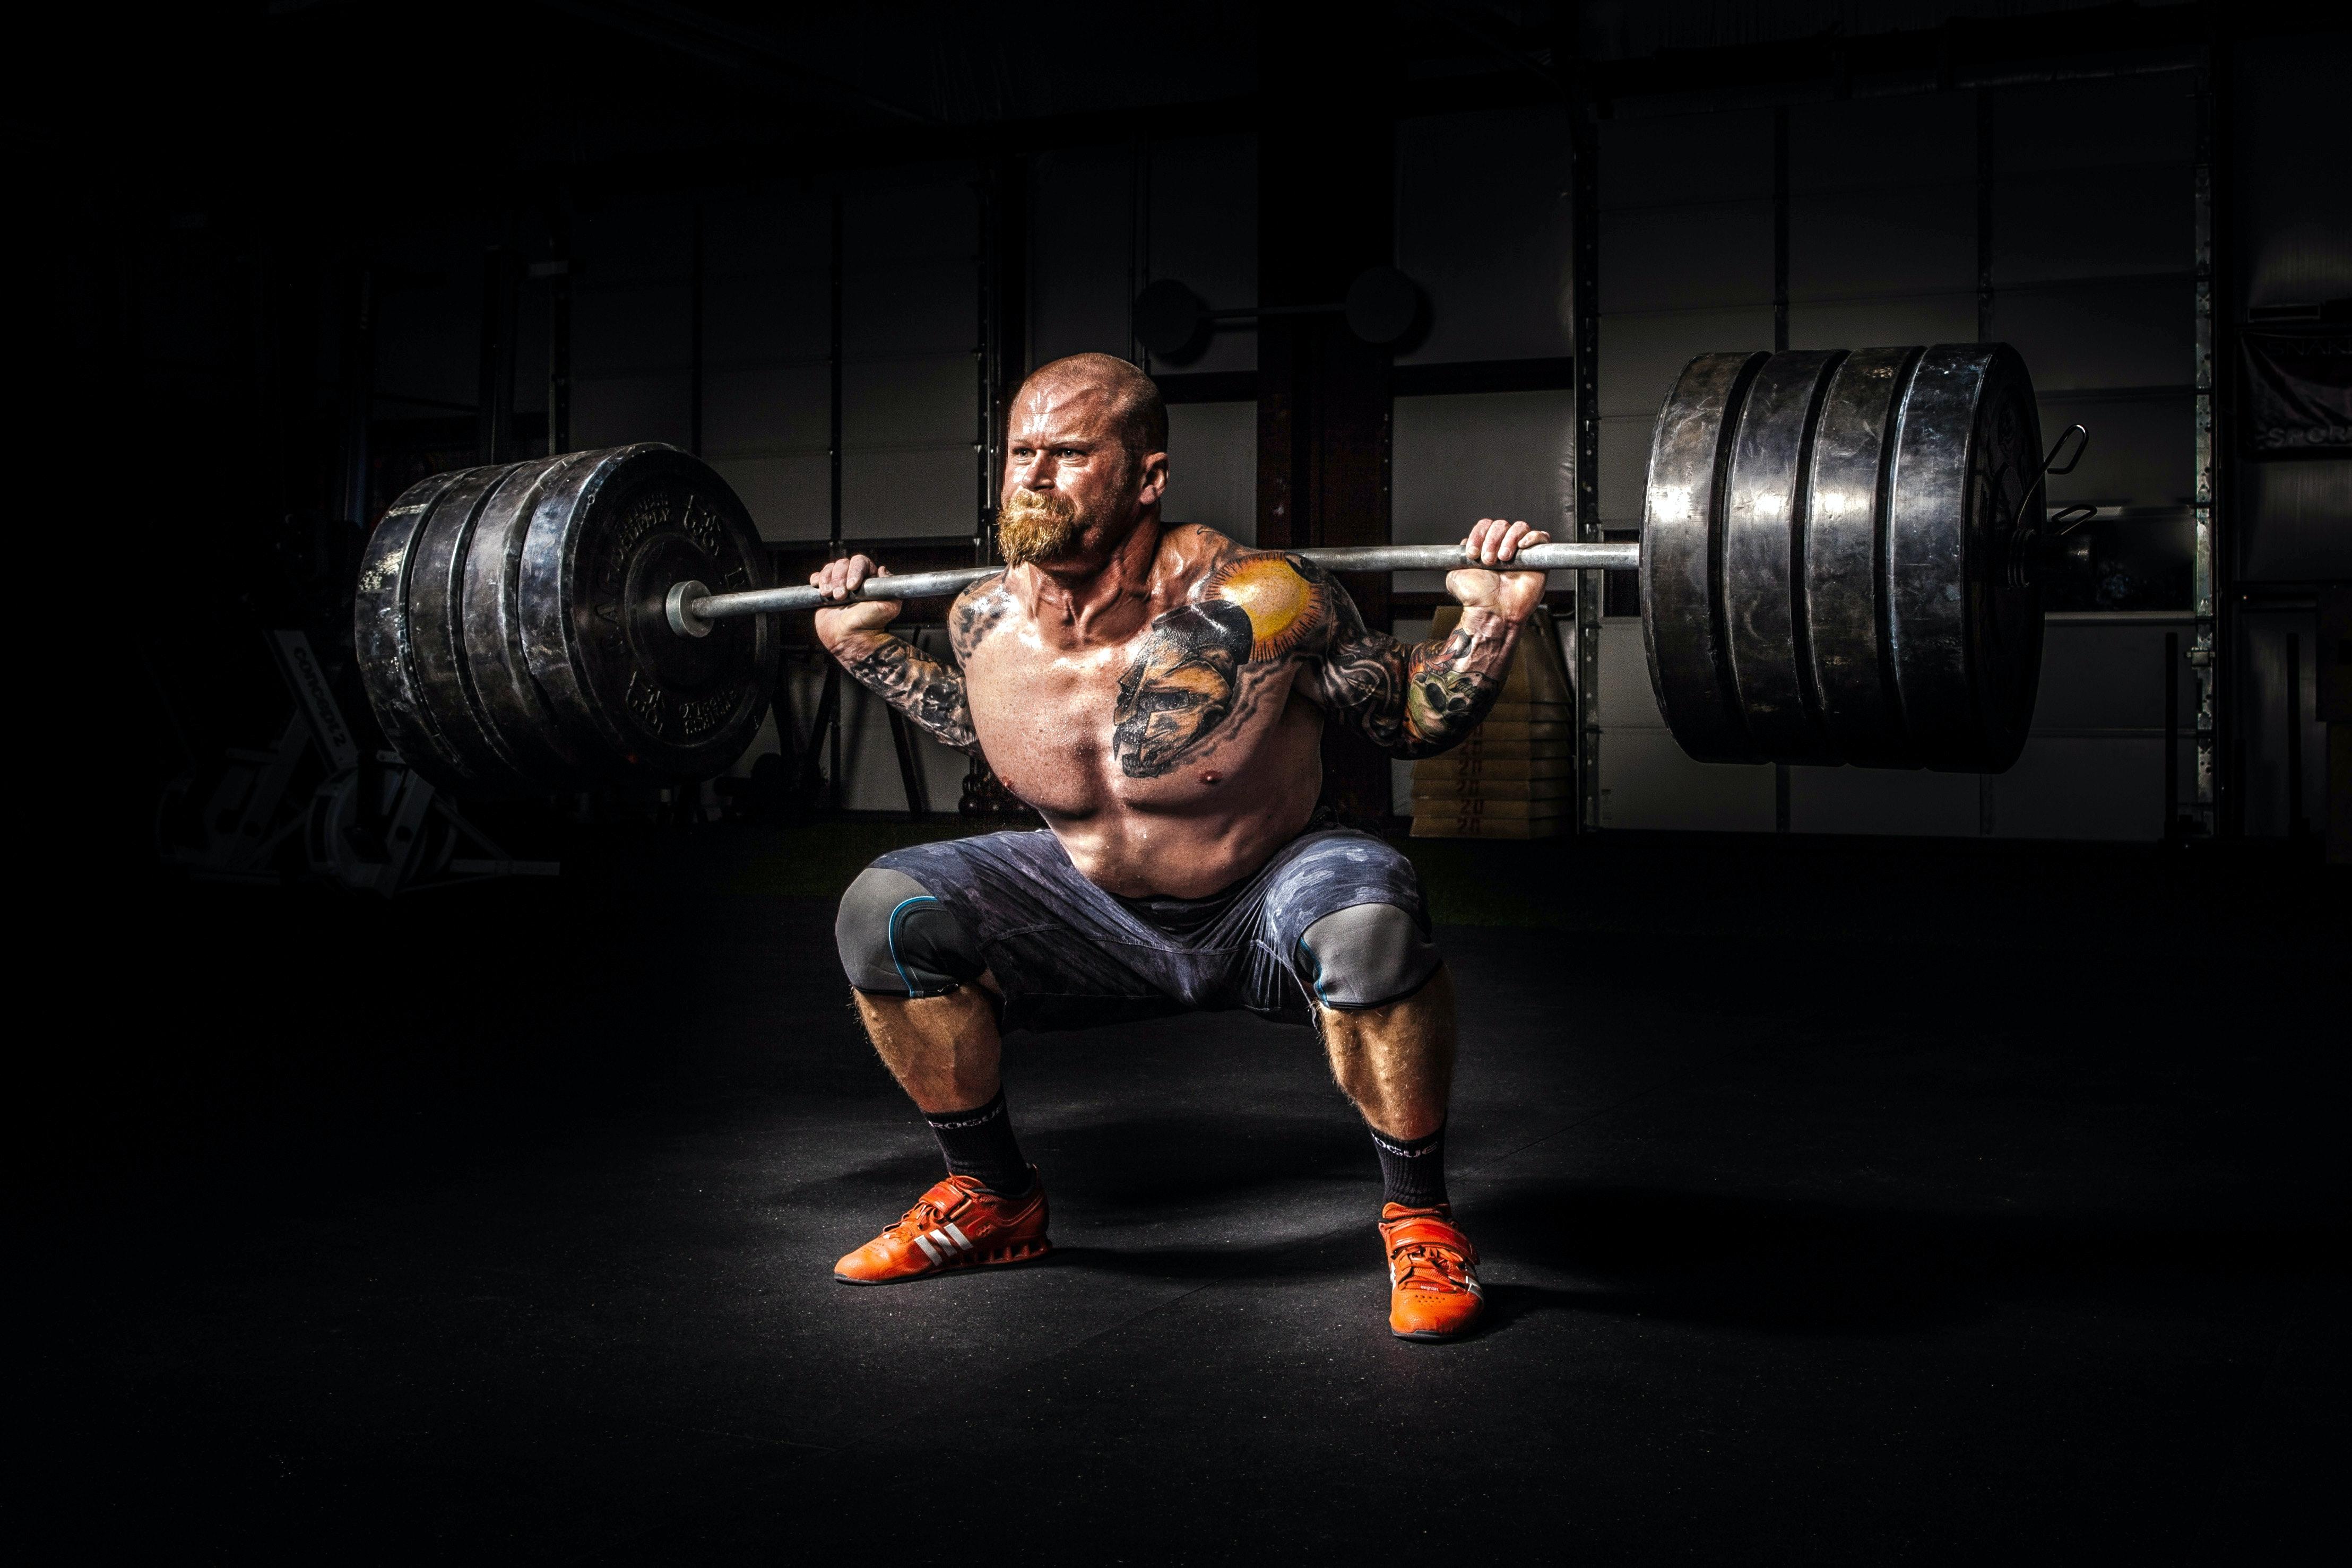 500 amazing fitness photos pexels free stock photos